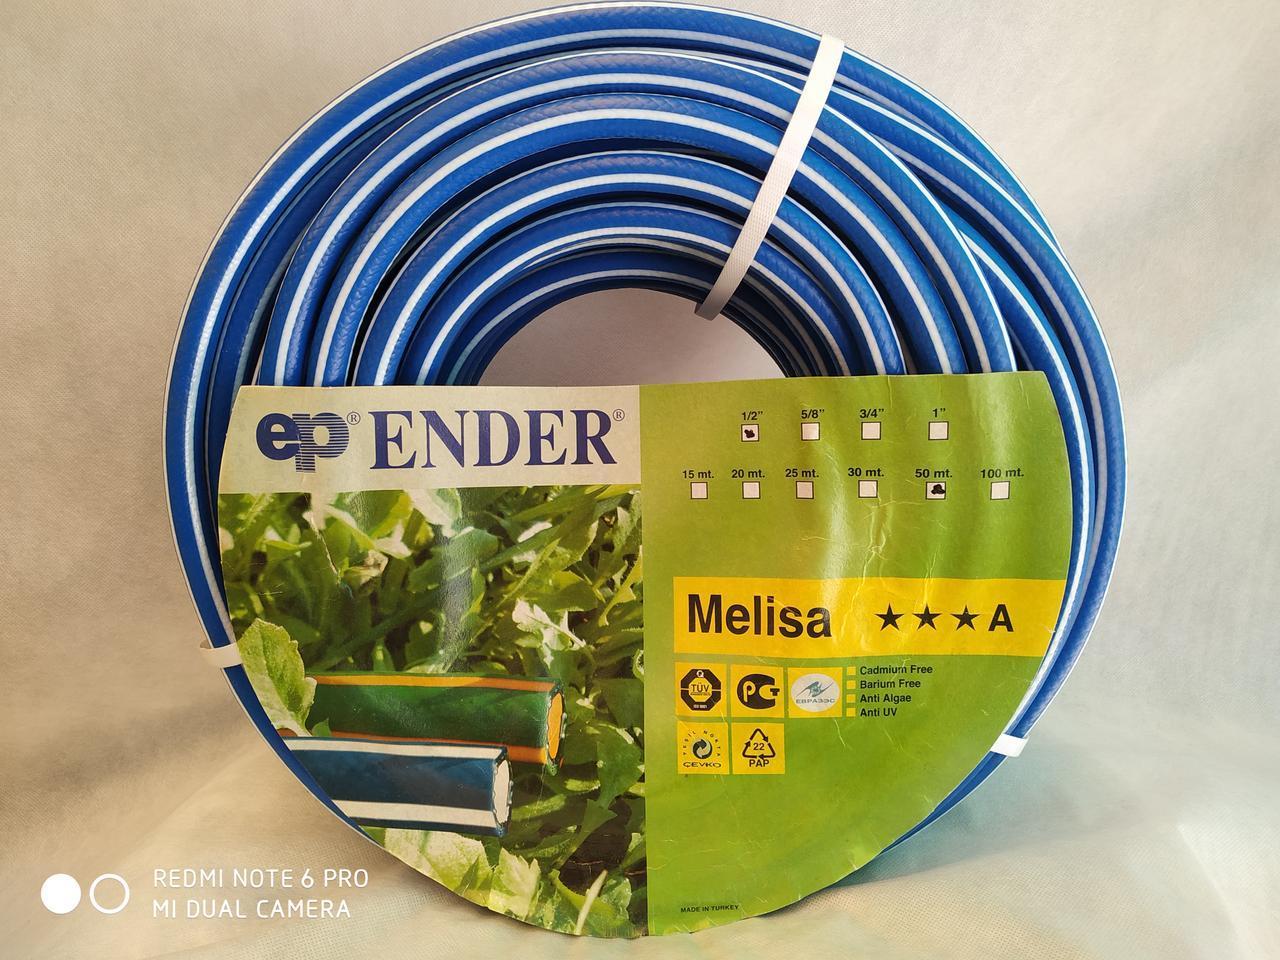 Шланг поливальний Ender Melisa 1/2 50м